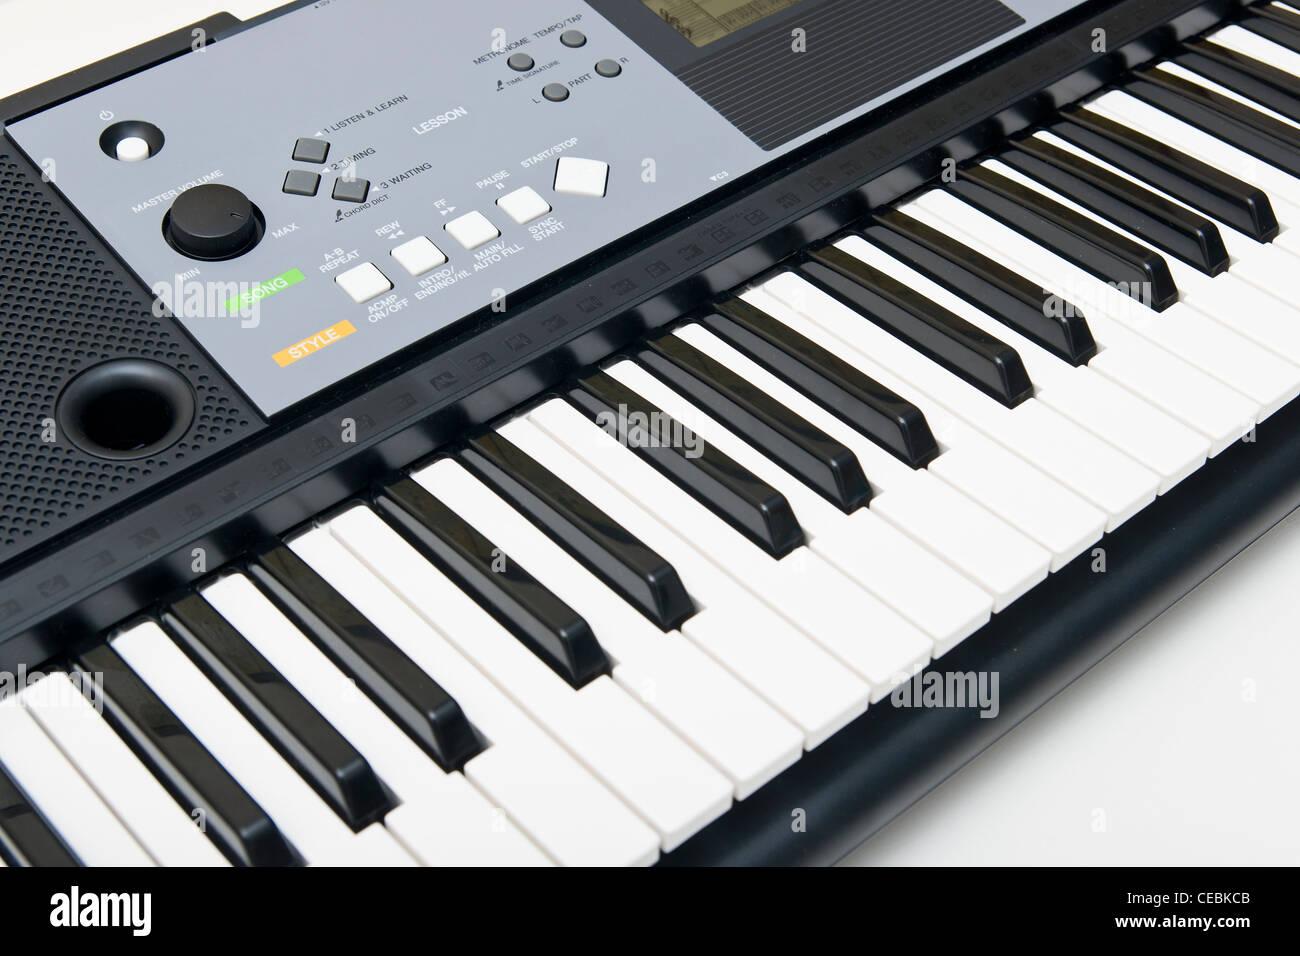 Electronic Piano Keyboard - Stock Image